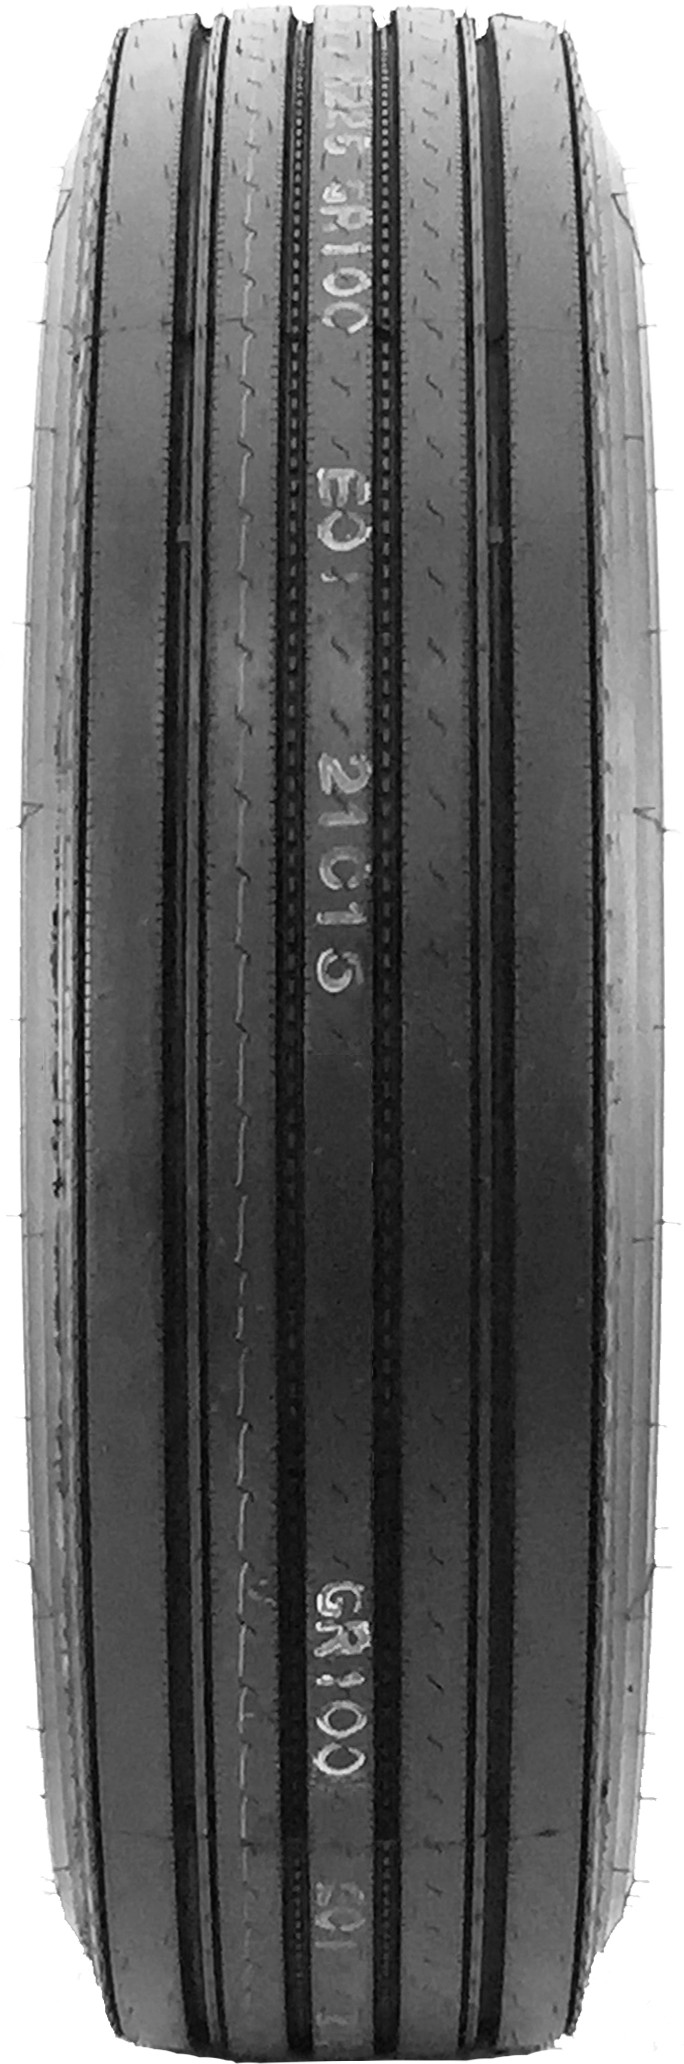 11R24.5-14 GR100 Line-Haul Premium Steering